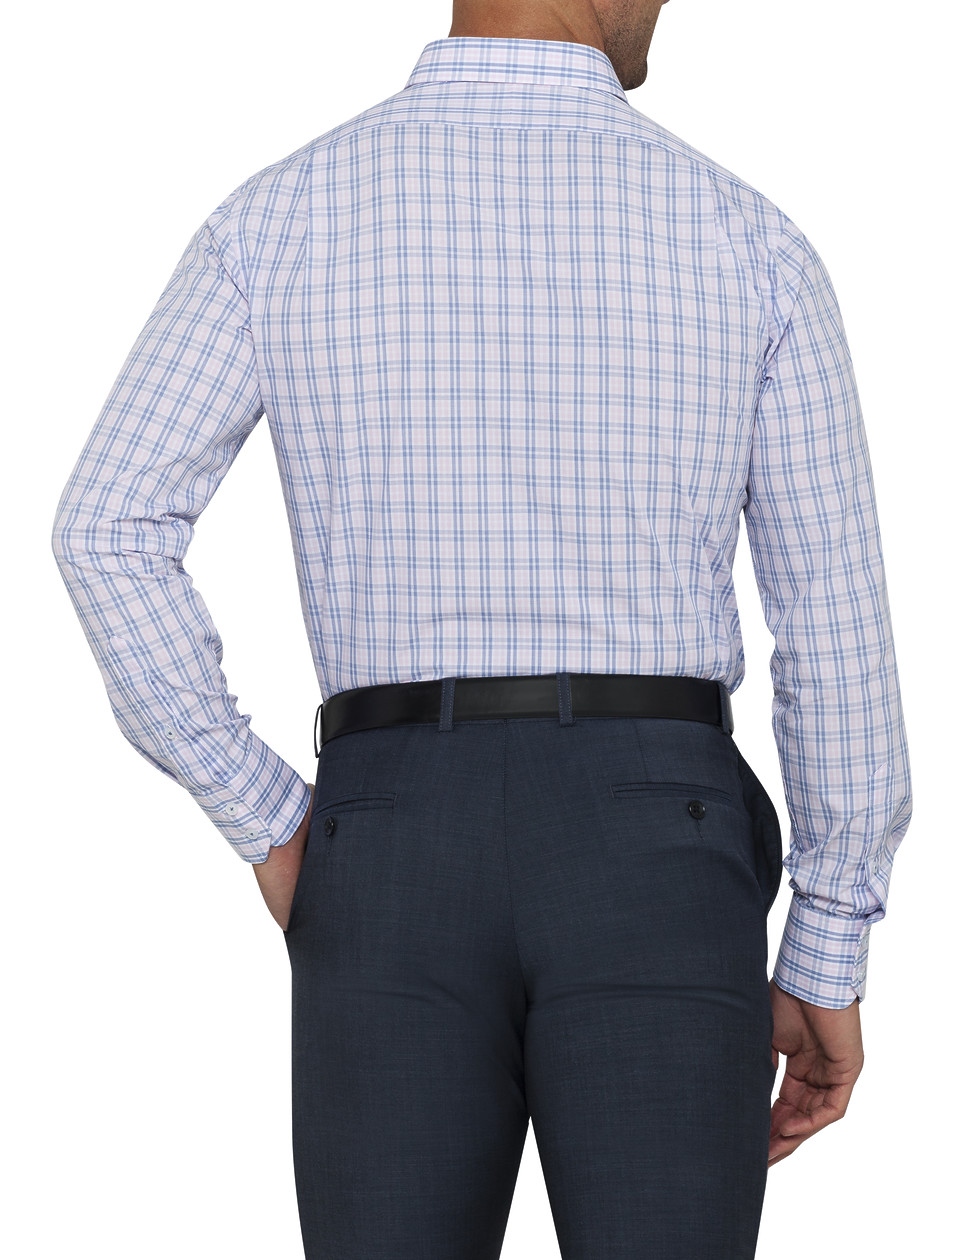 Mens Euro Fit Shirt Pink Blue Large Check Van Heusen